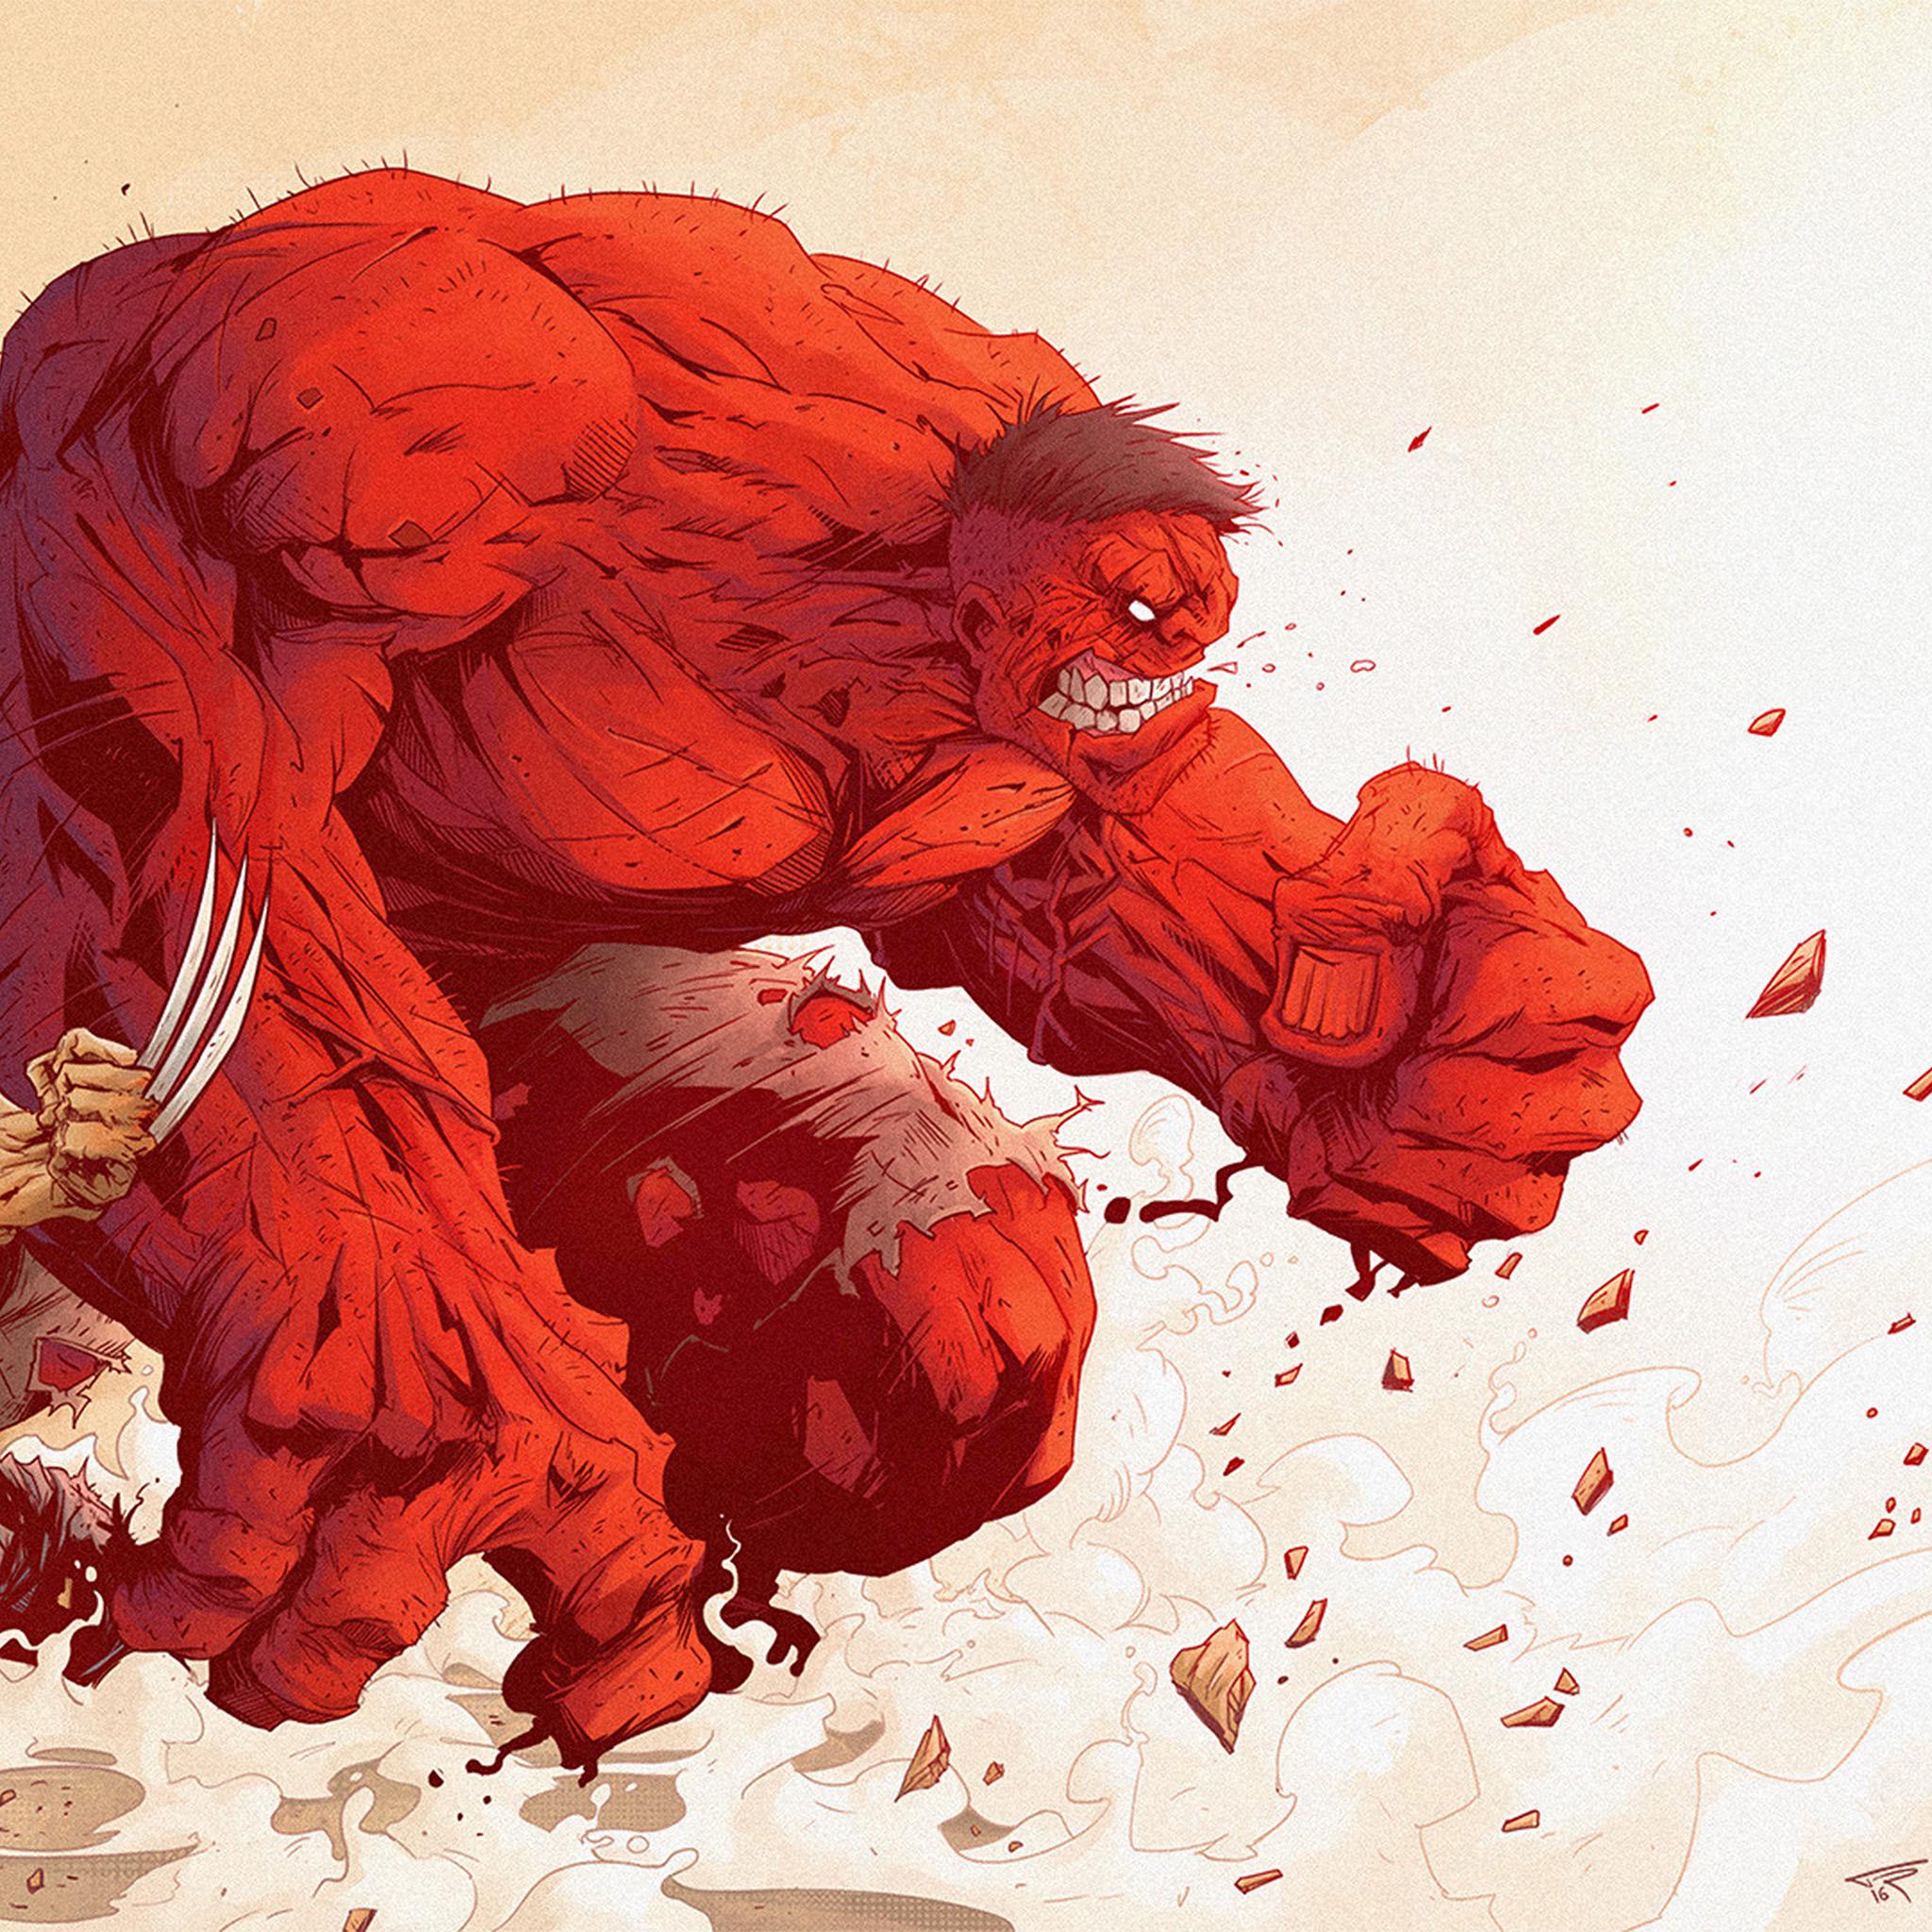 X Men Iphone Wallpaper Hd Aw95 Hulk Anime Tonton Revolver Illustration Art Red Hero